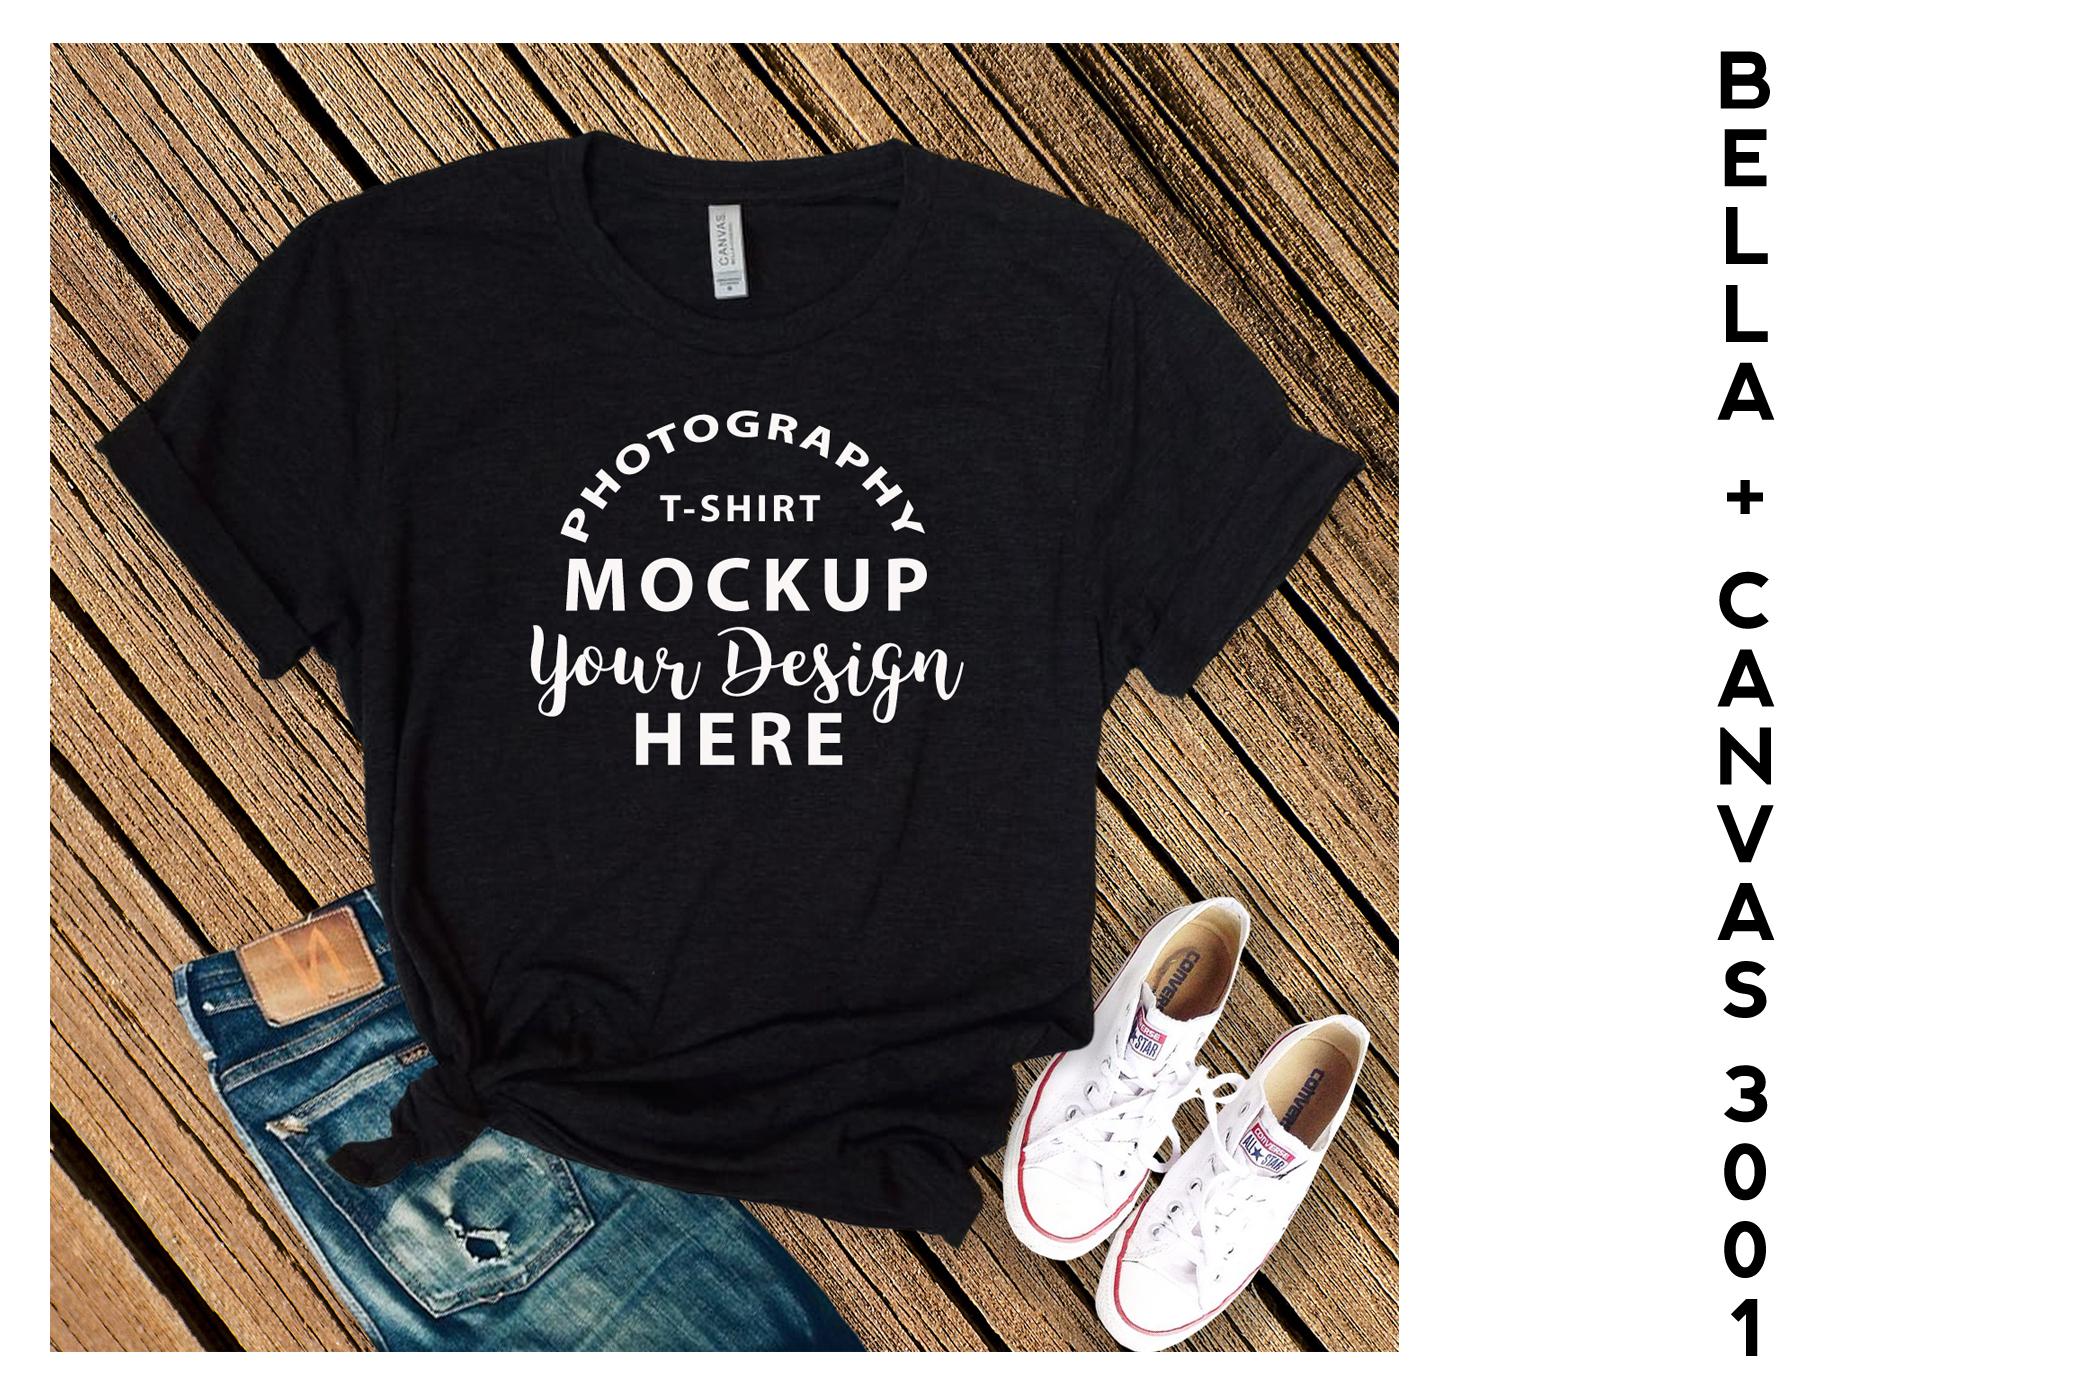 Bella Canvas 3001 T-shirt mock-up, color Black Heather example image 1